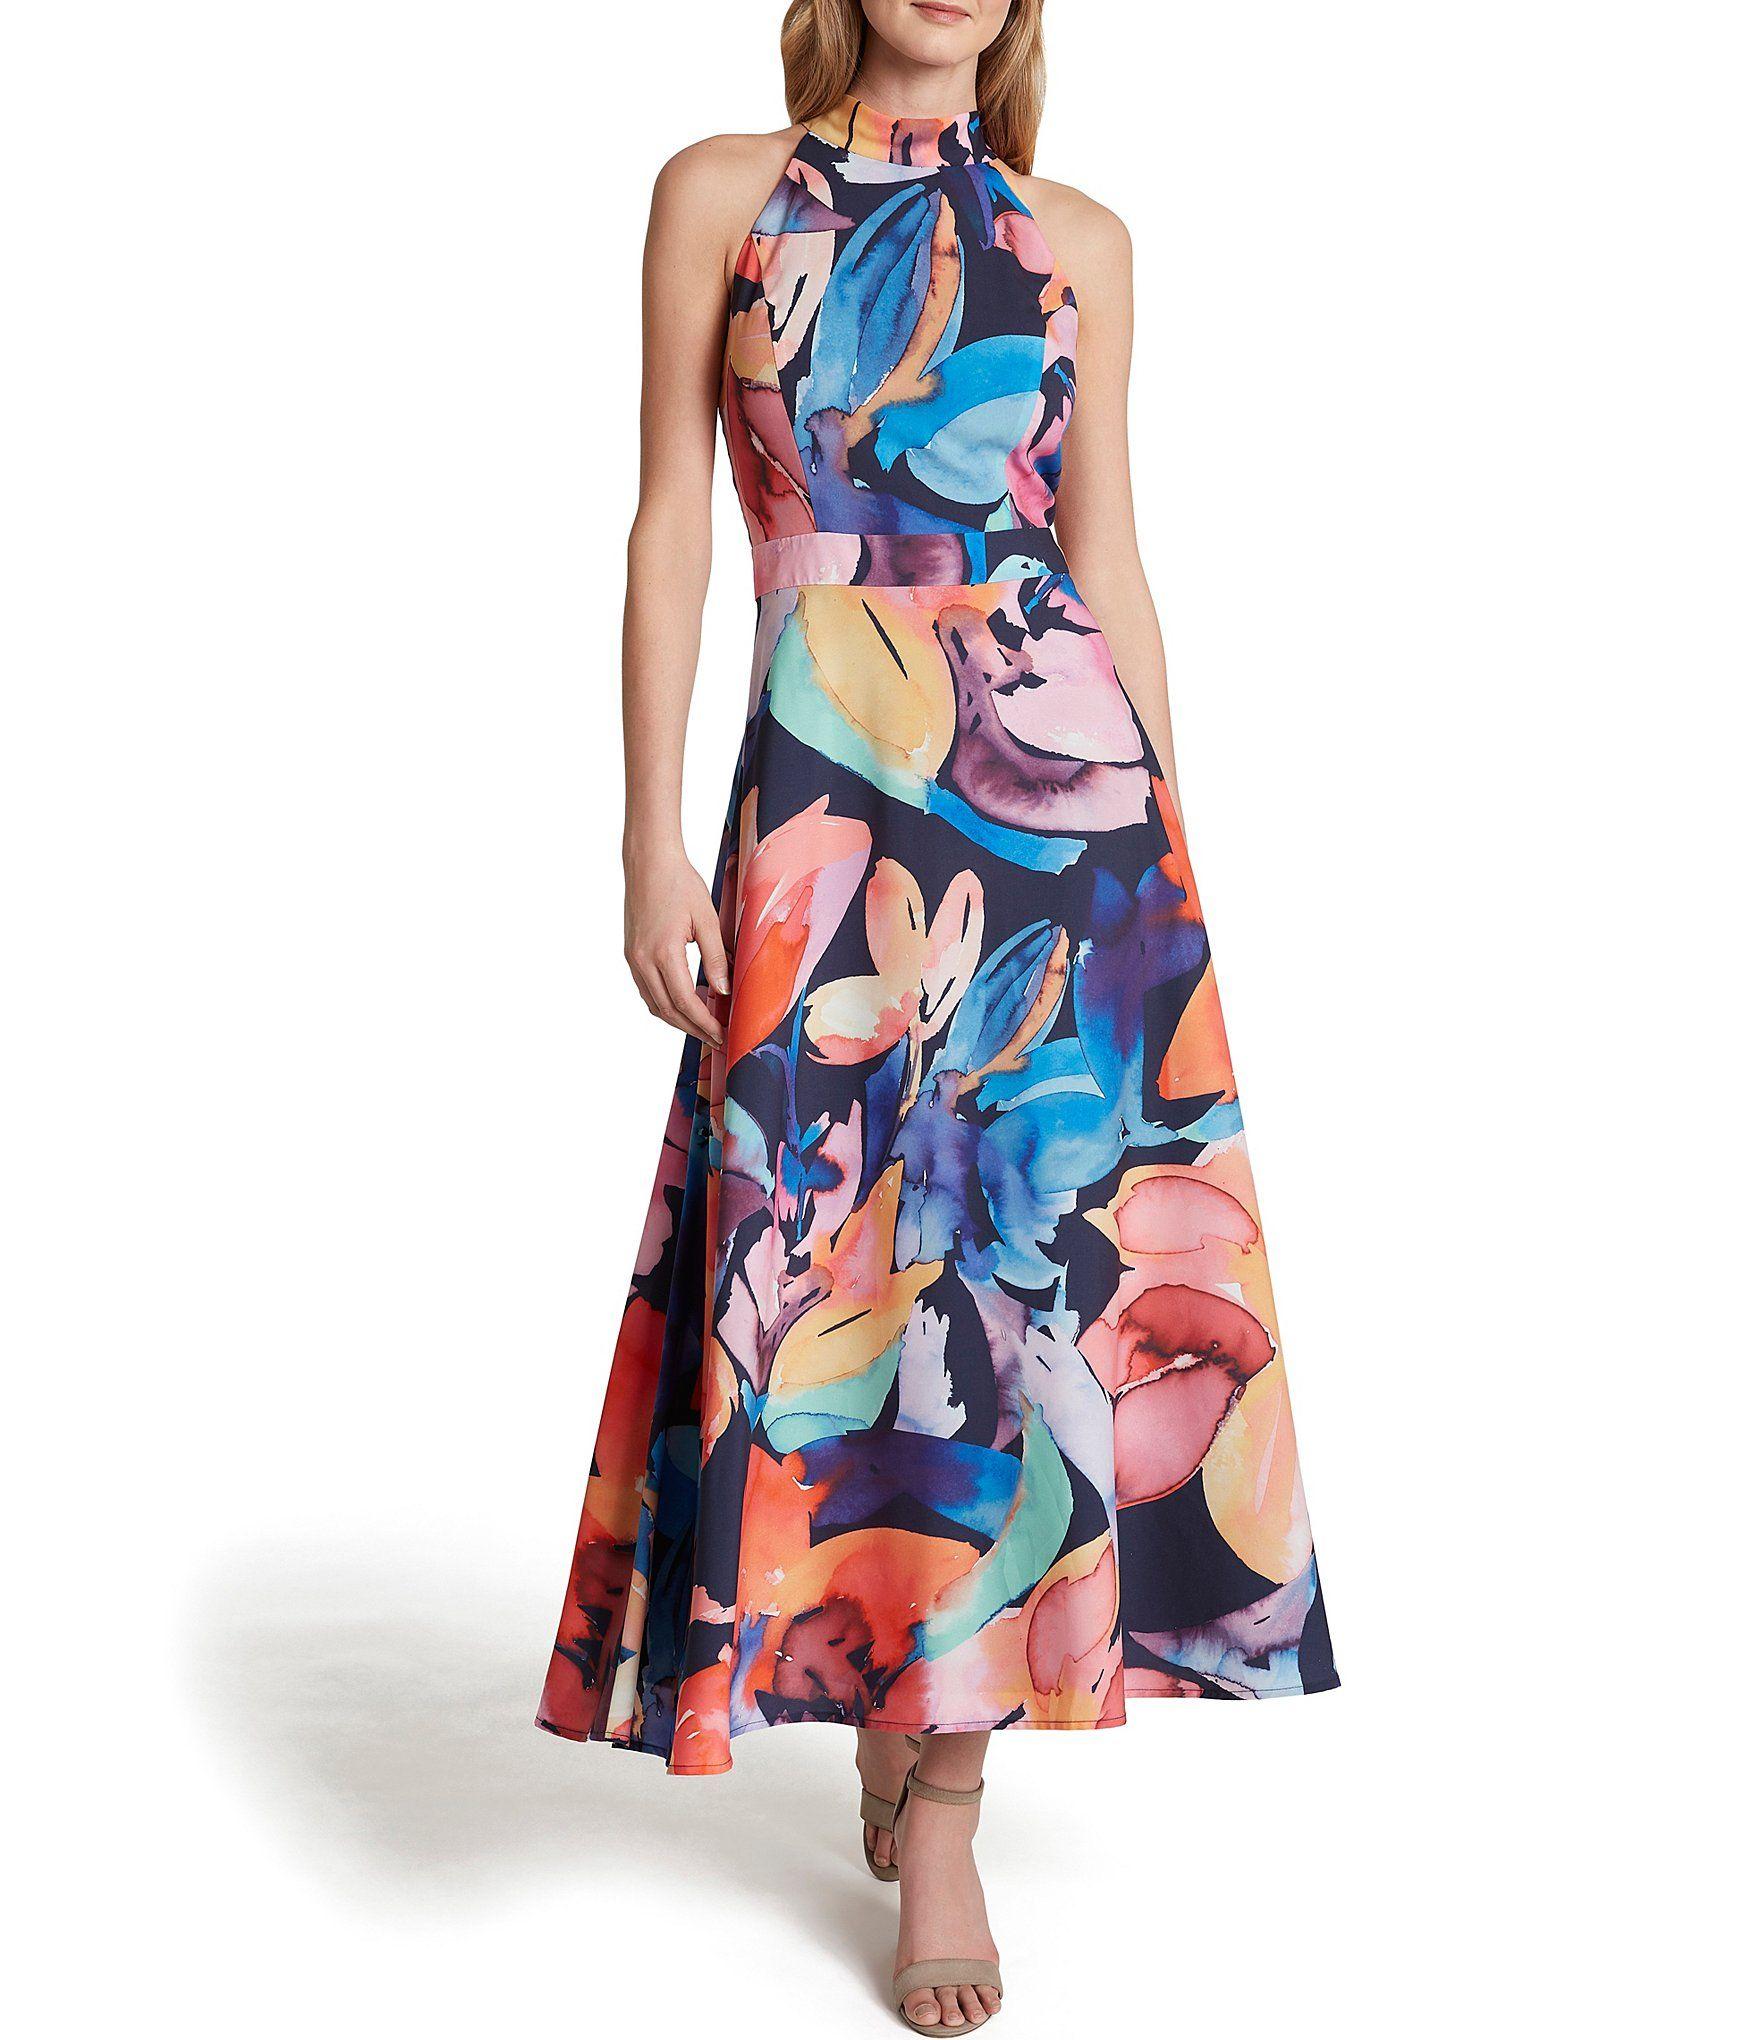 Tahari Asl Abstract Floral Printed Mock Neck Sleeveless Crepe De Chine Maxi Dress Dillard S Dresses Halter Maxi Dresses Spring Wedding Guest Dress [ 2040 x 1760 Pixel ]